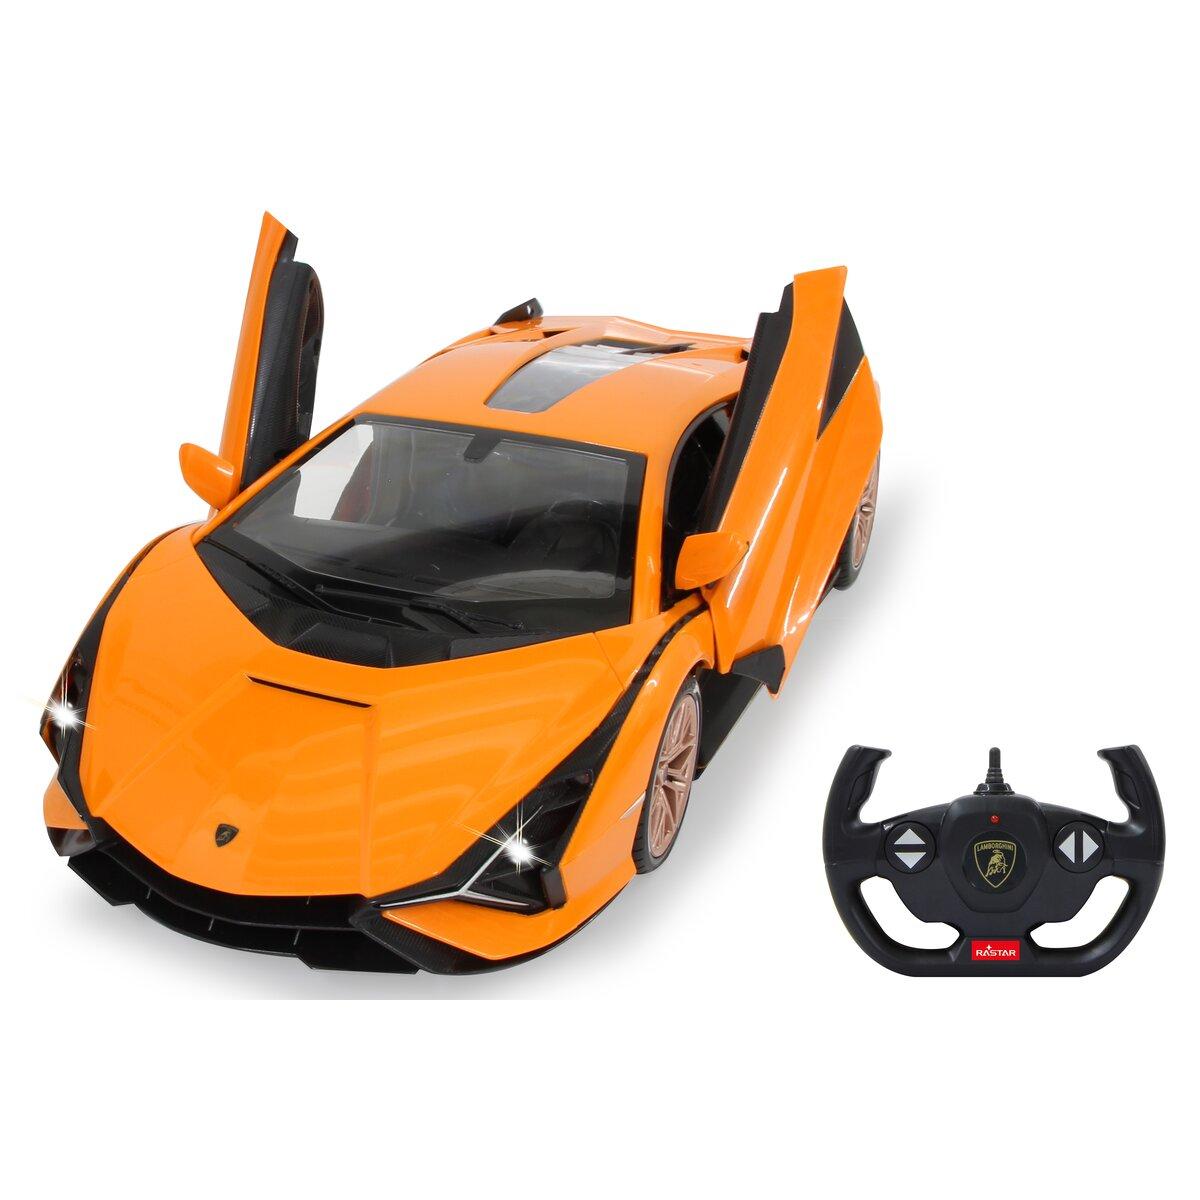 Jamara Lamborghini Sián 1:14 orange 2,4GHz manual doors